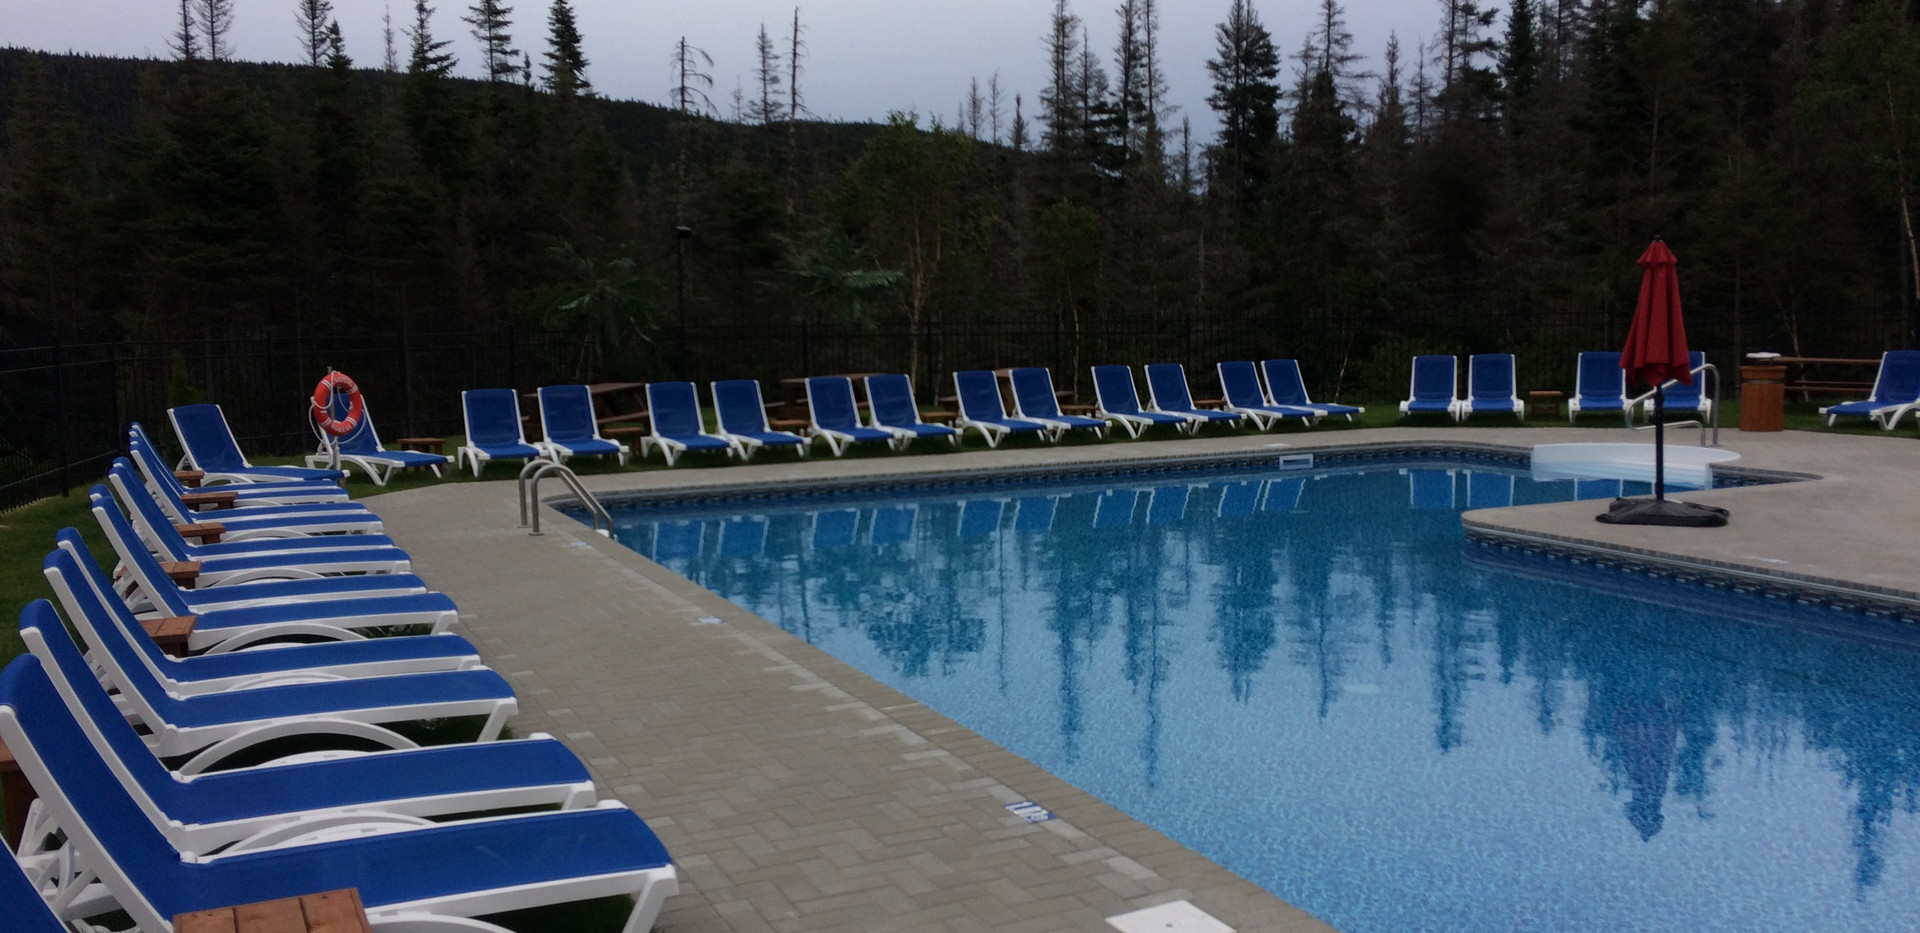 piscine-glissade-eau-camping-boreal-8.JP